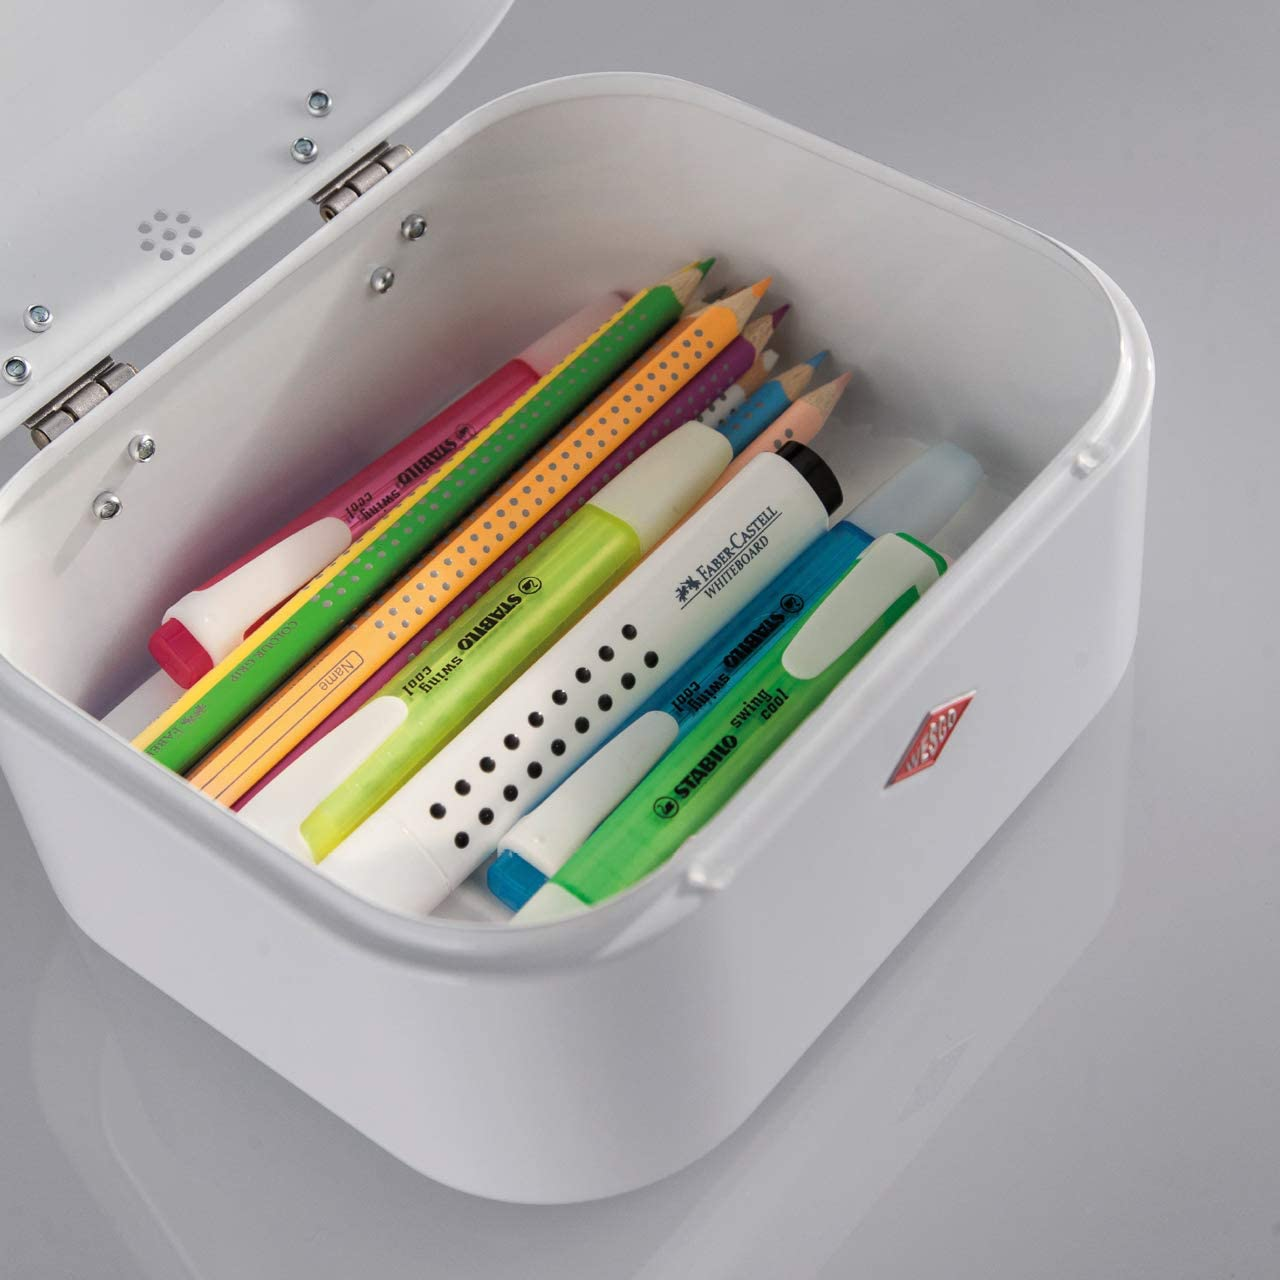 WESCO Mini Grandy Storage Box 18/x 17/x 12 cm Black Standard